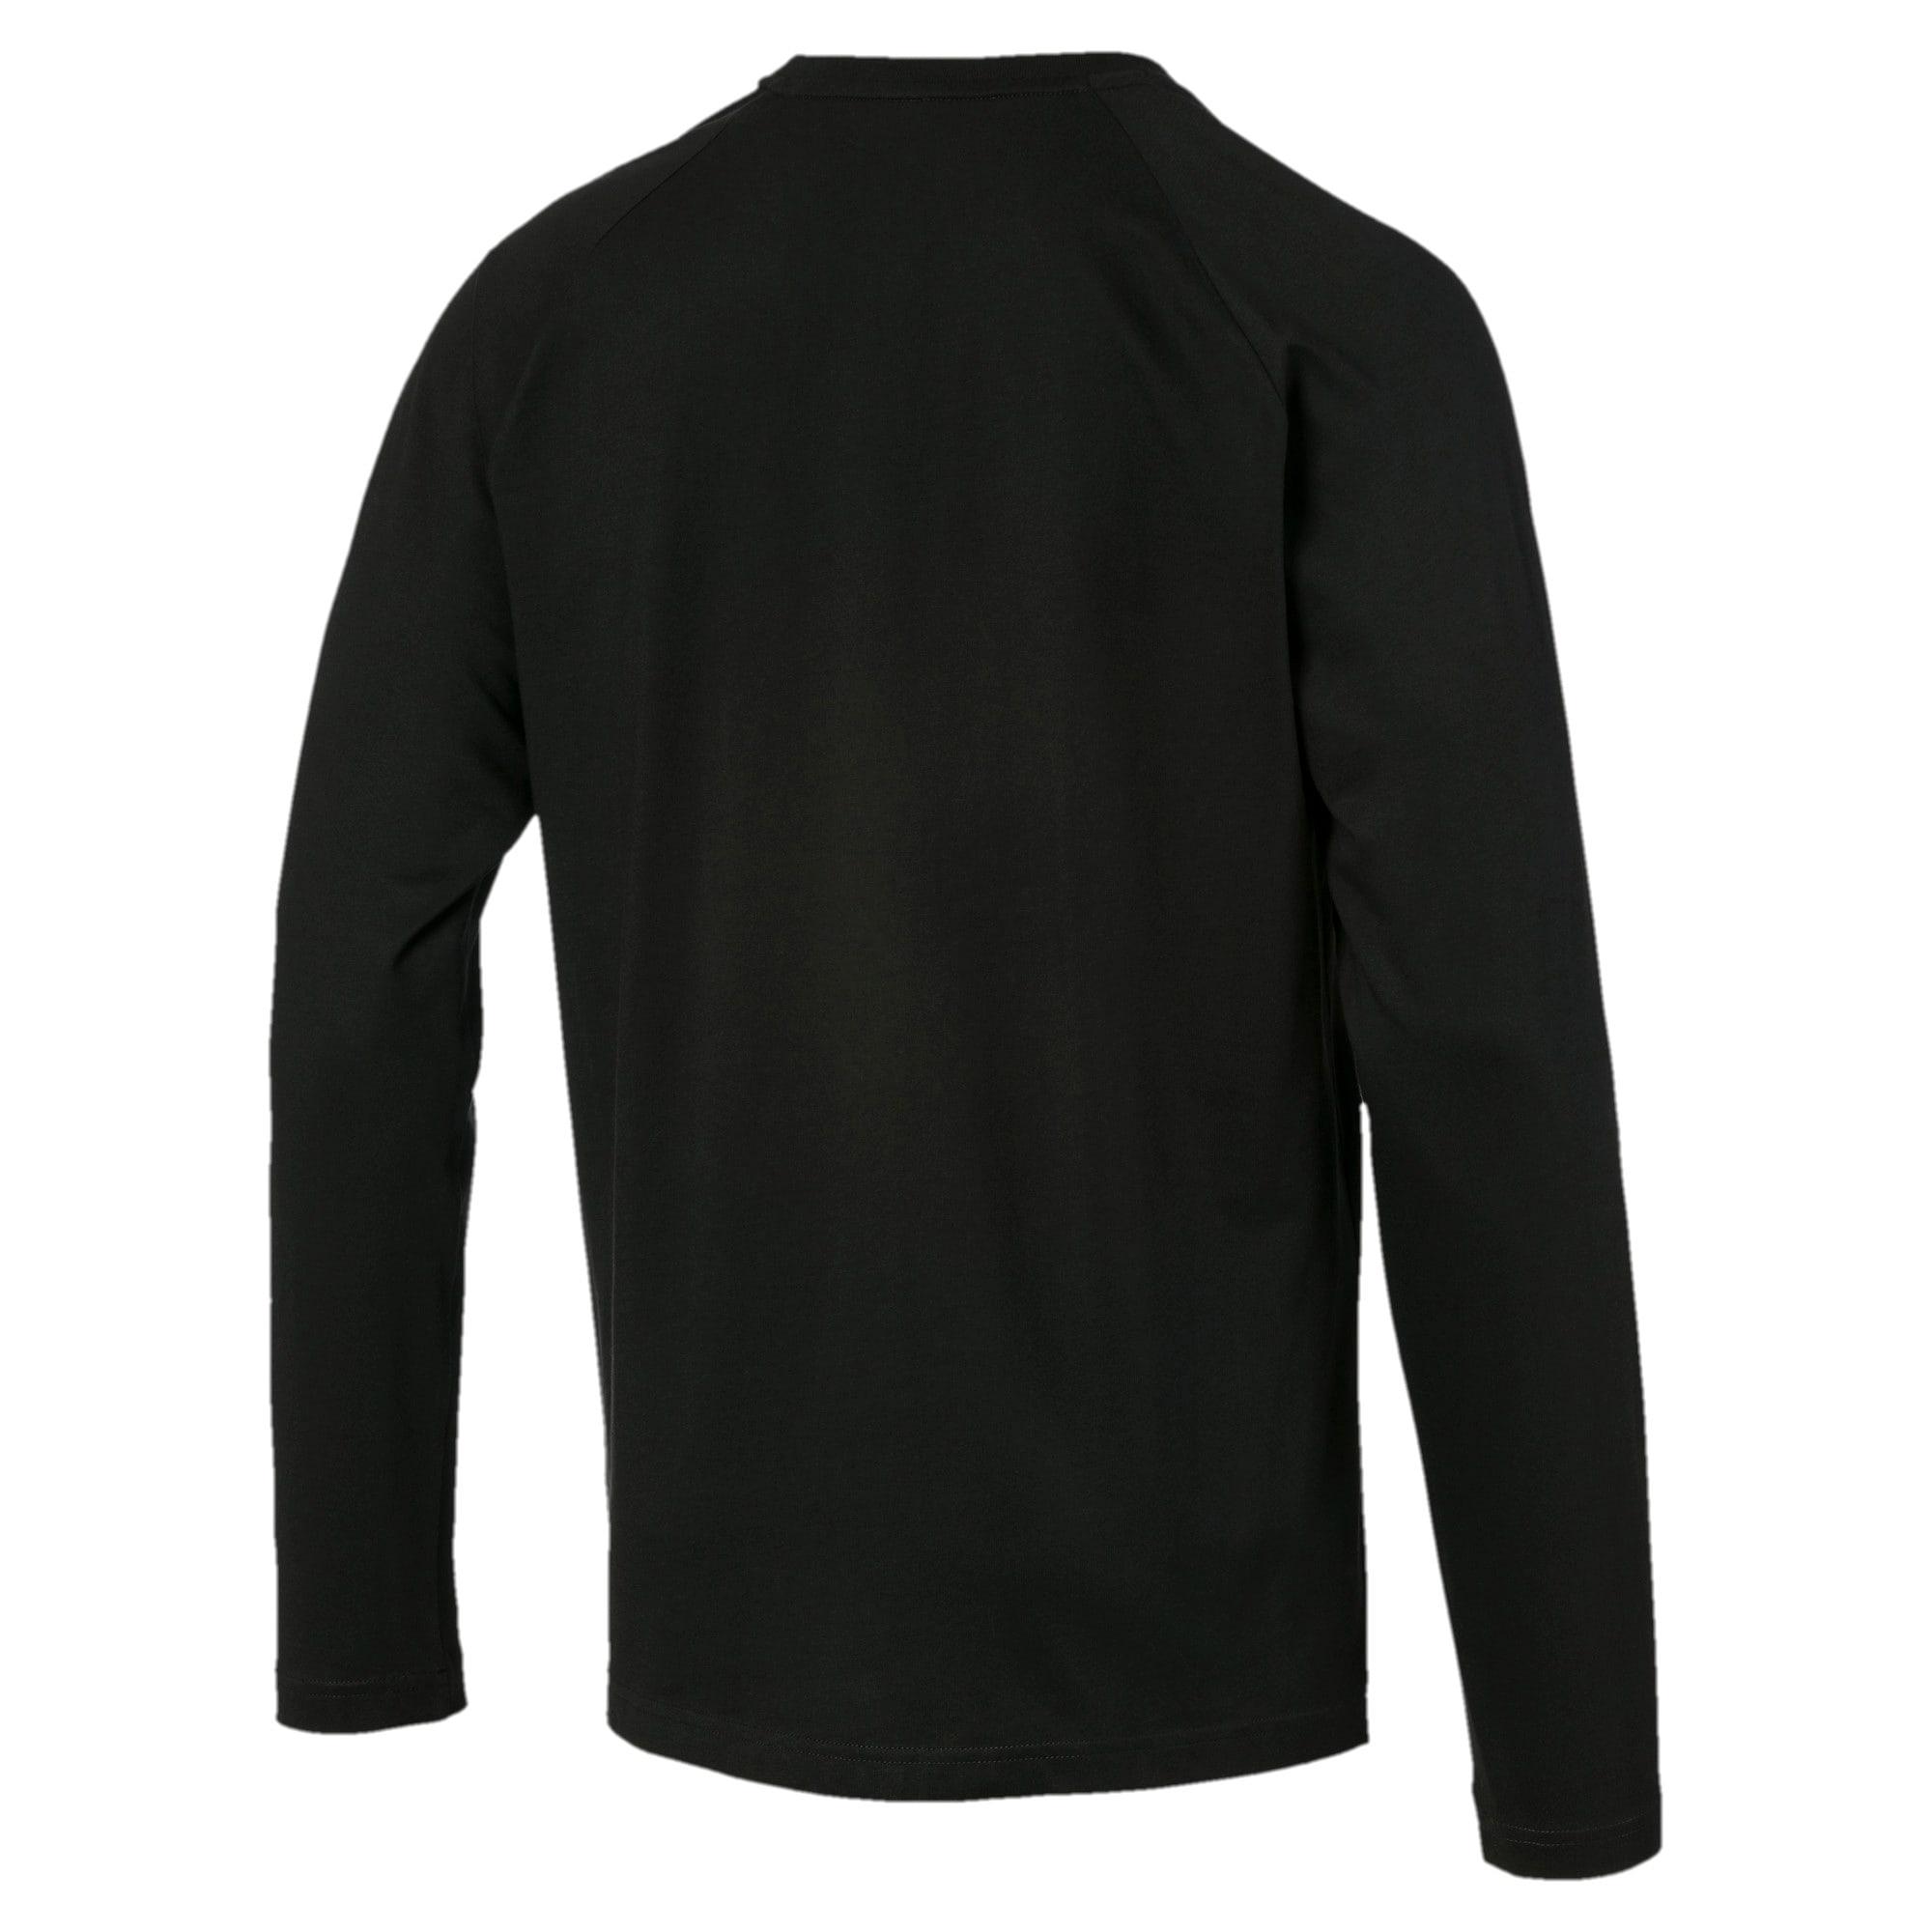 Thumbnail 5 of Modern Sports Men's Long Sleeve Tee, Puma Black, medium